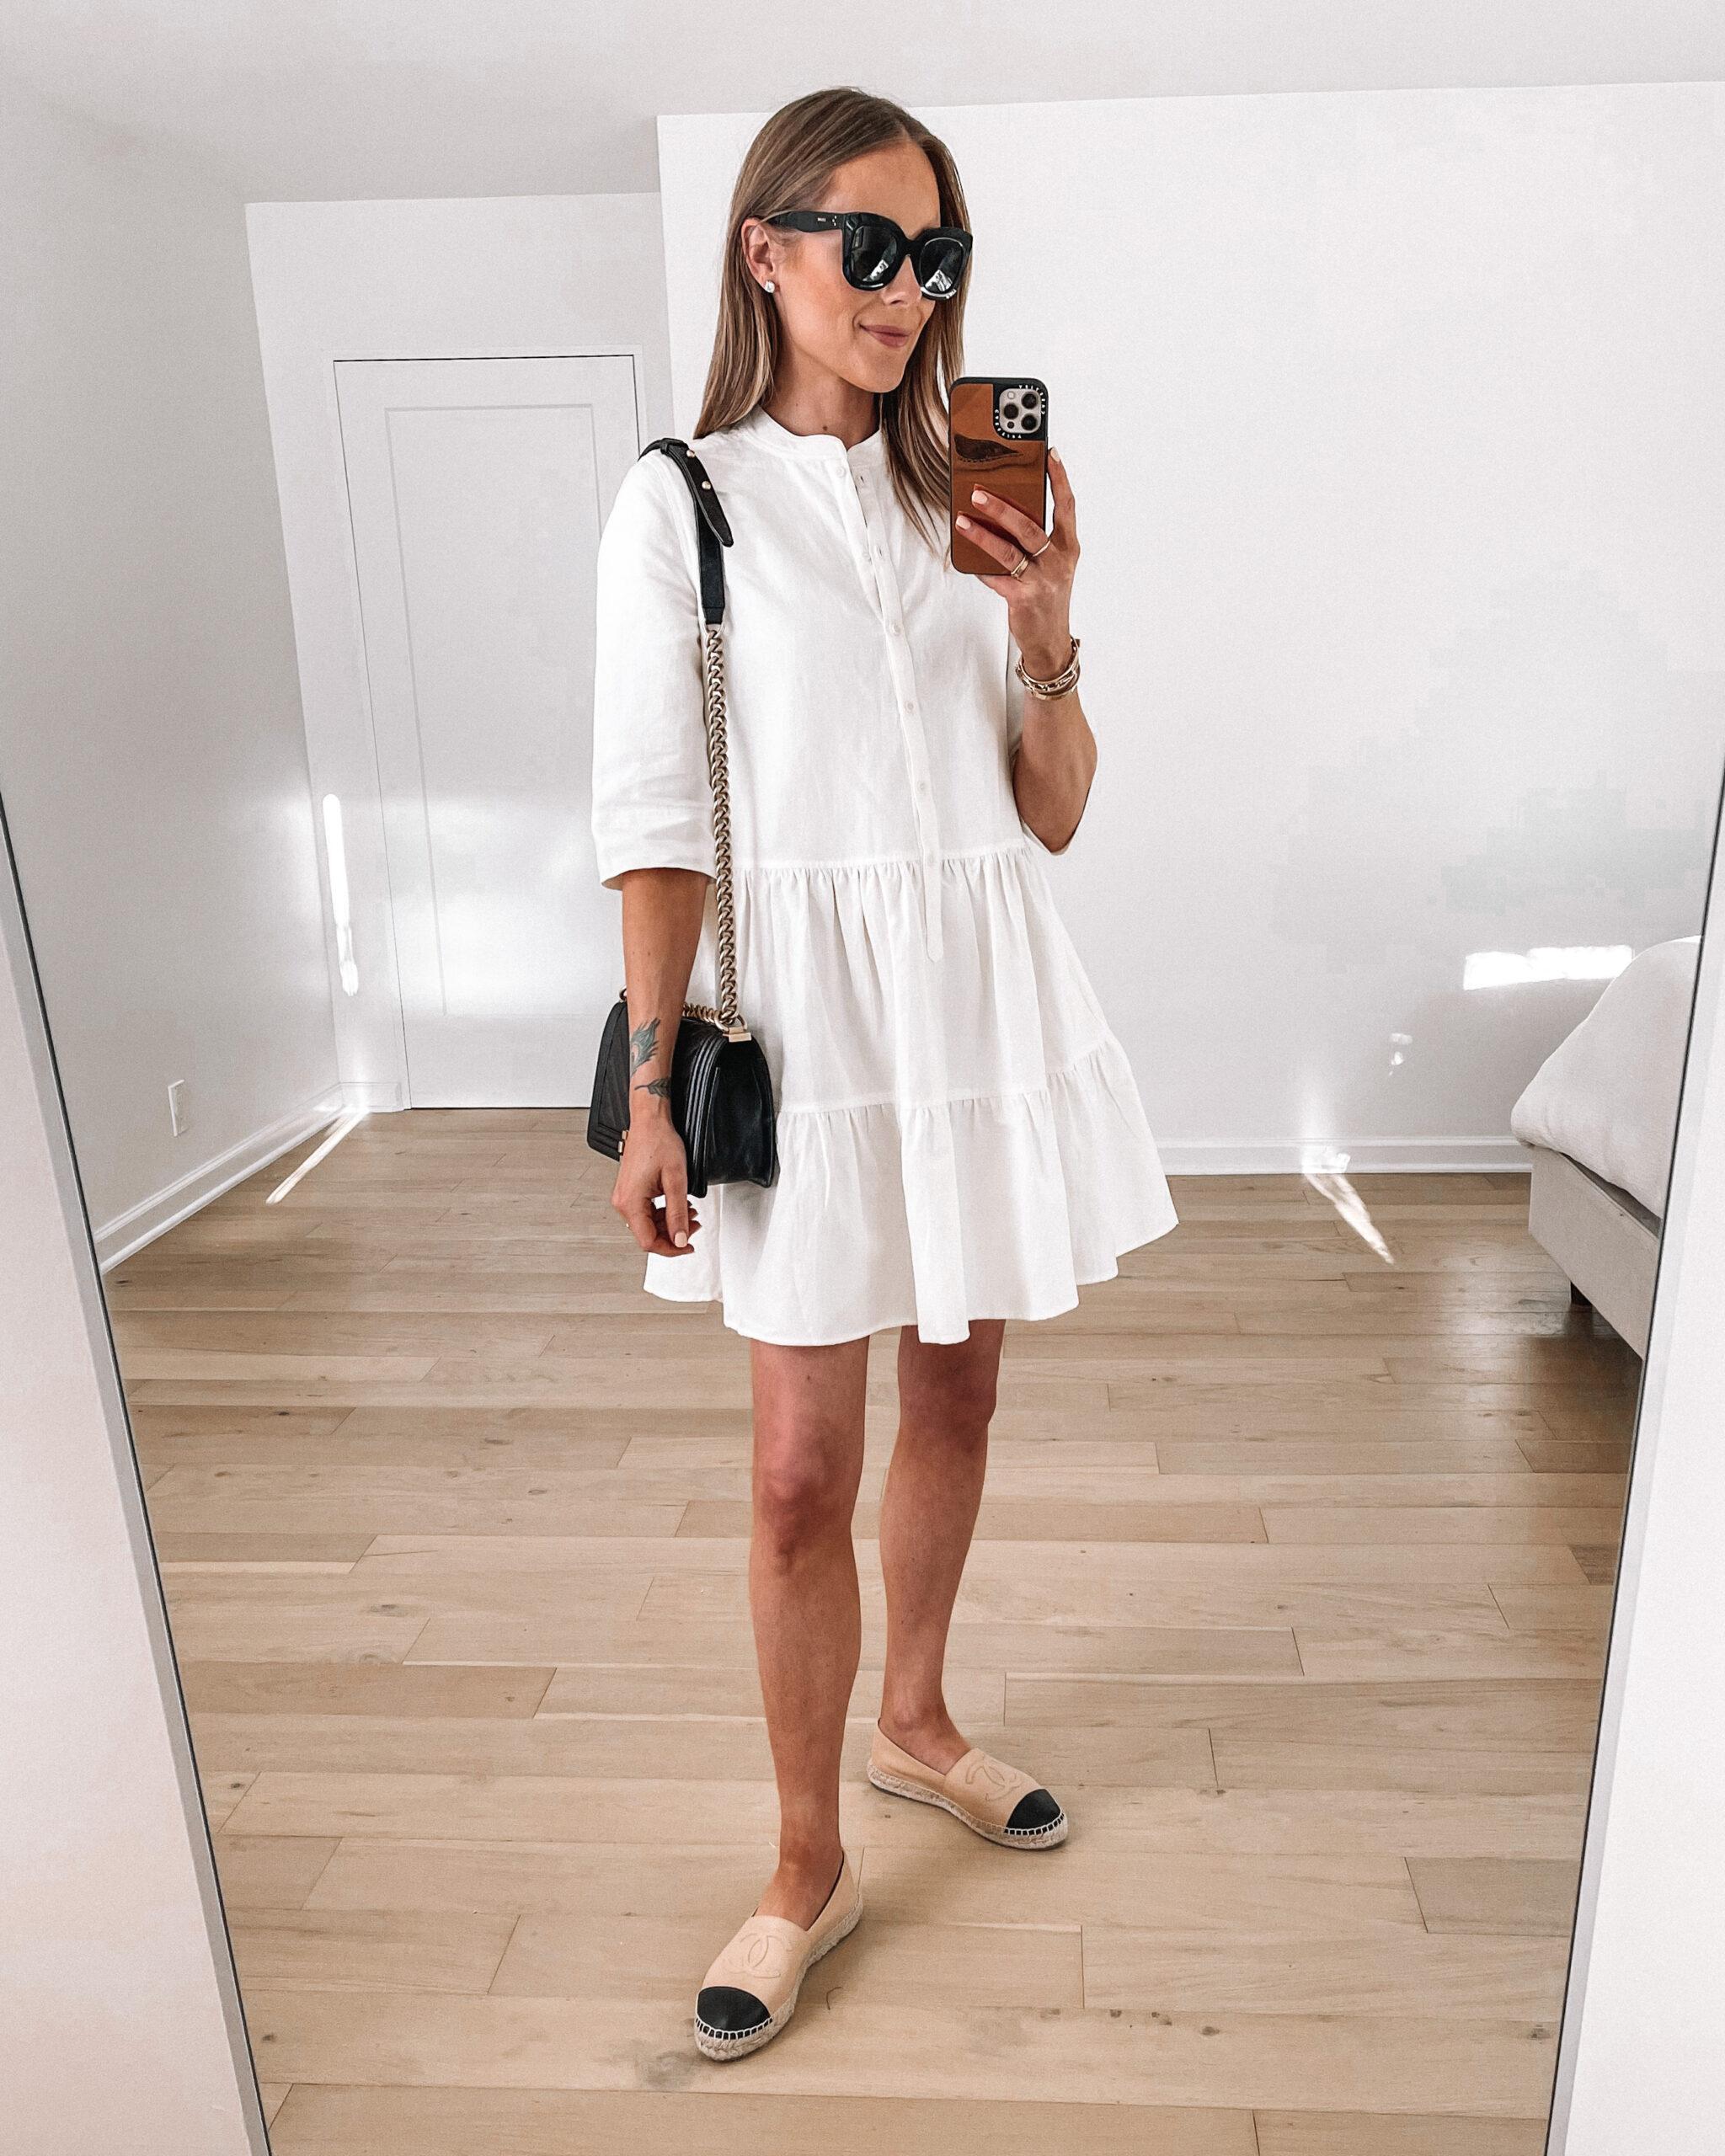 Fashion Jackson Wearing White Tiered Mini Dress Chanel Espadrilles